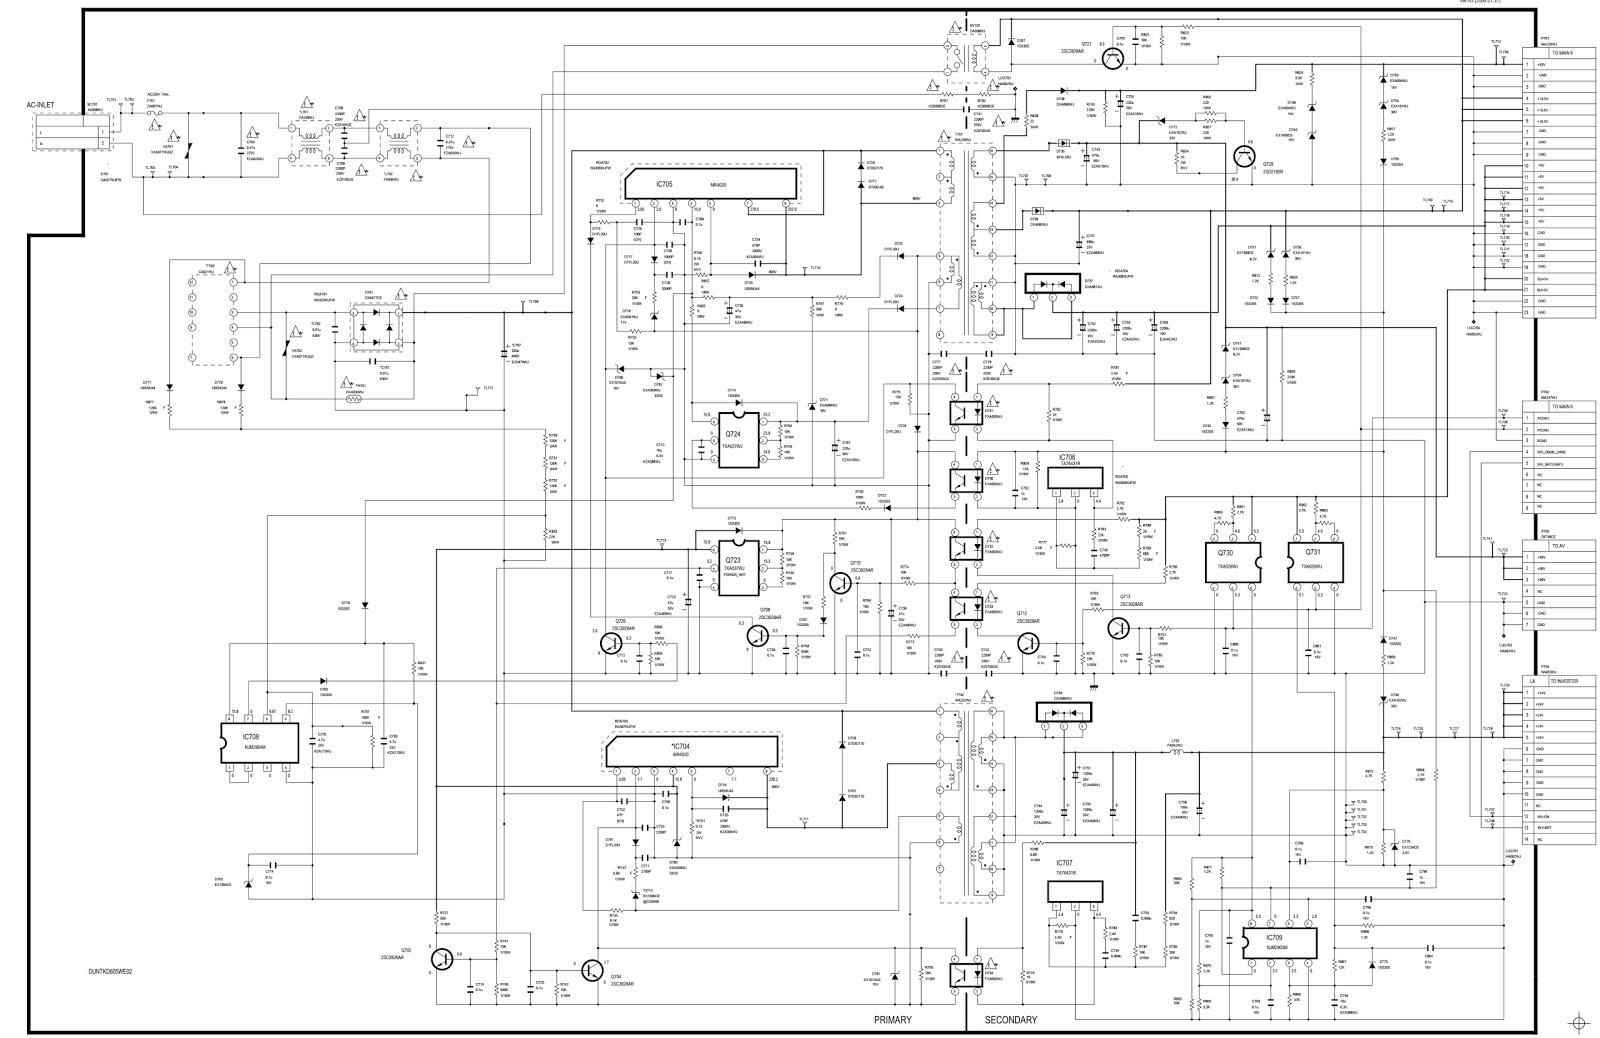 Fantastisch Smps Pinbelegung Ideen - Schaltplan Serie Circuit ...